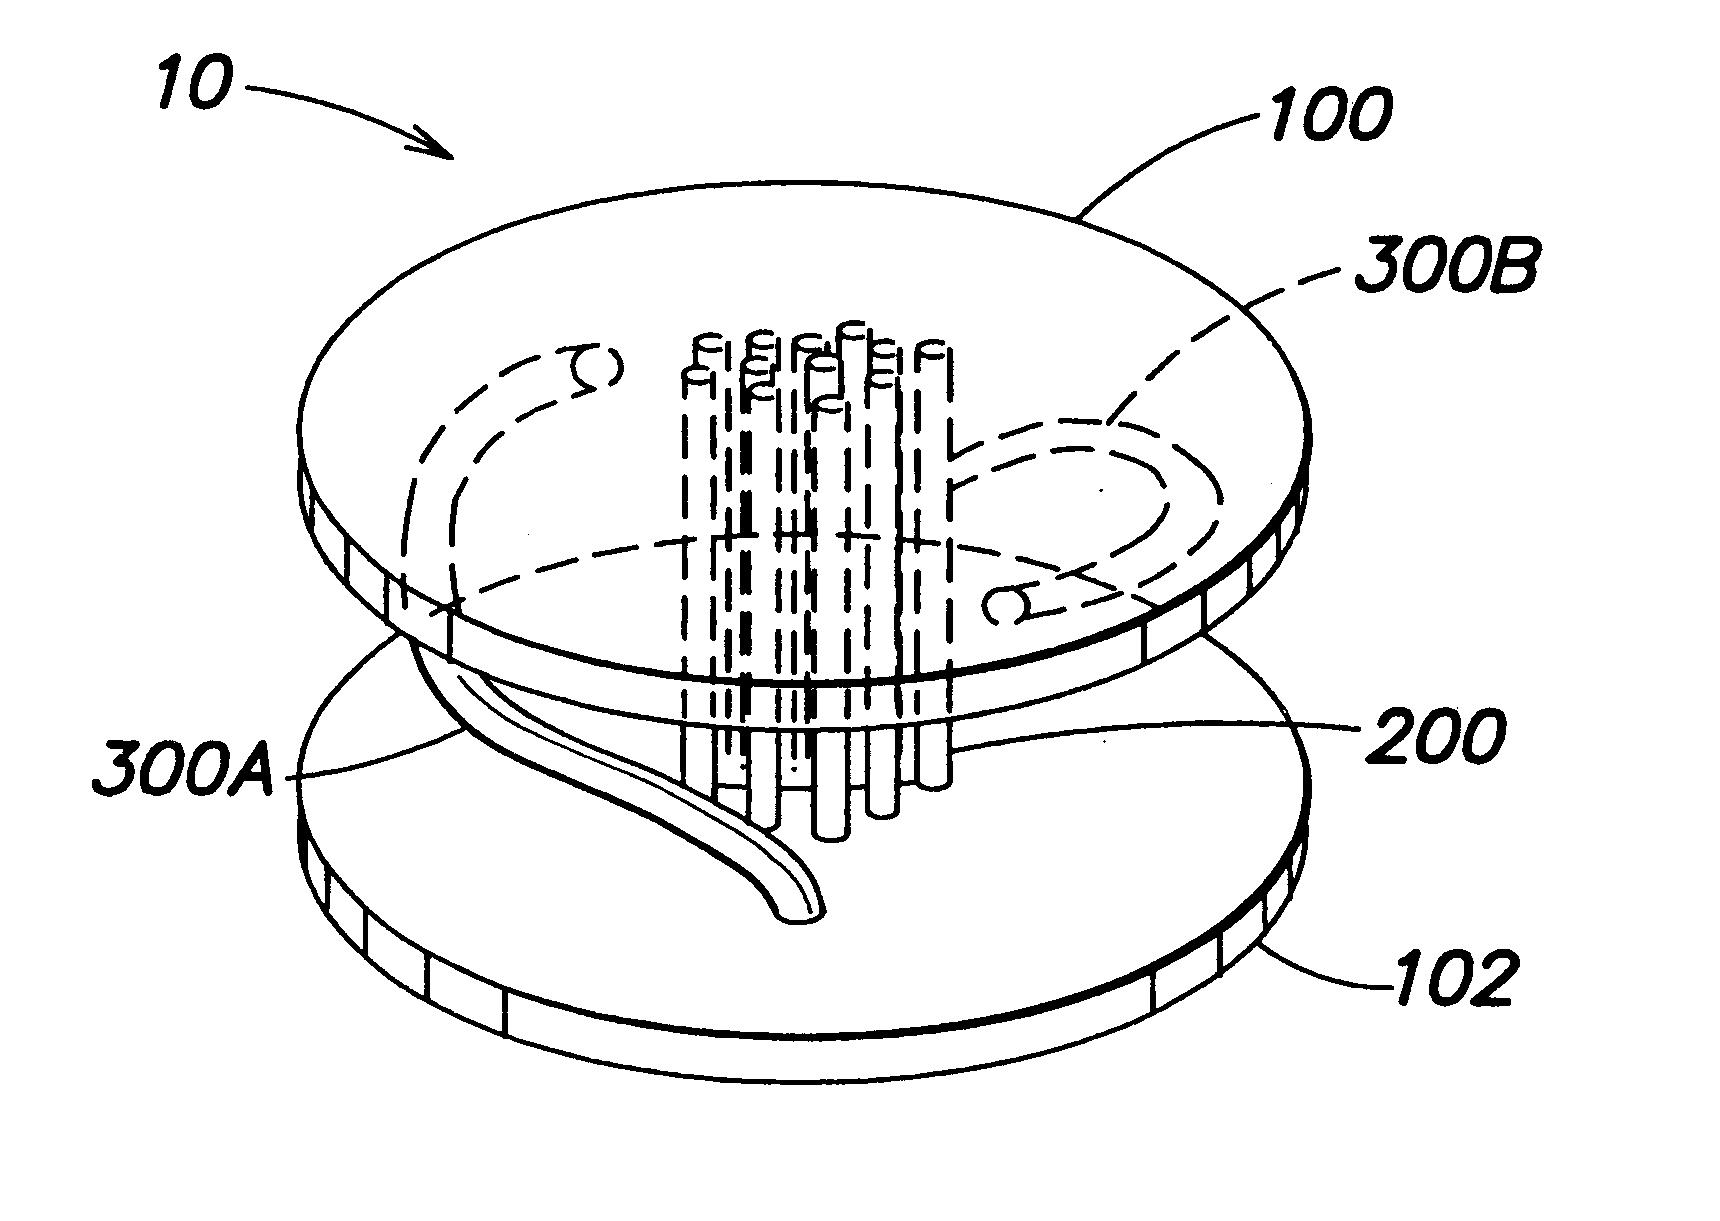 patent us6520996 orthopedic implant patents Braces Ortho Tech patent drawing